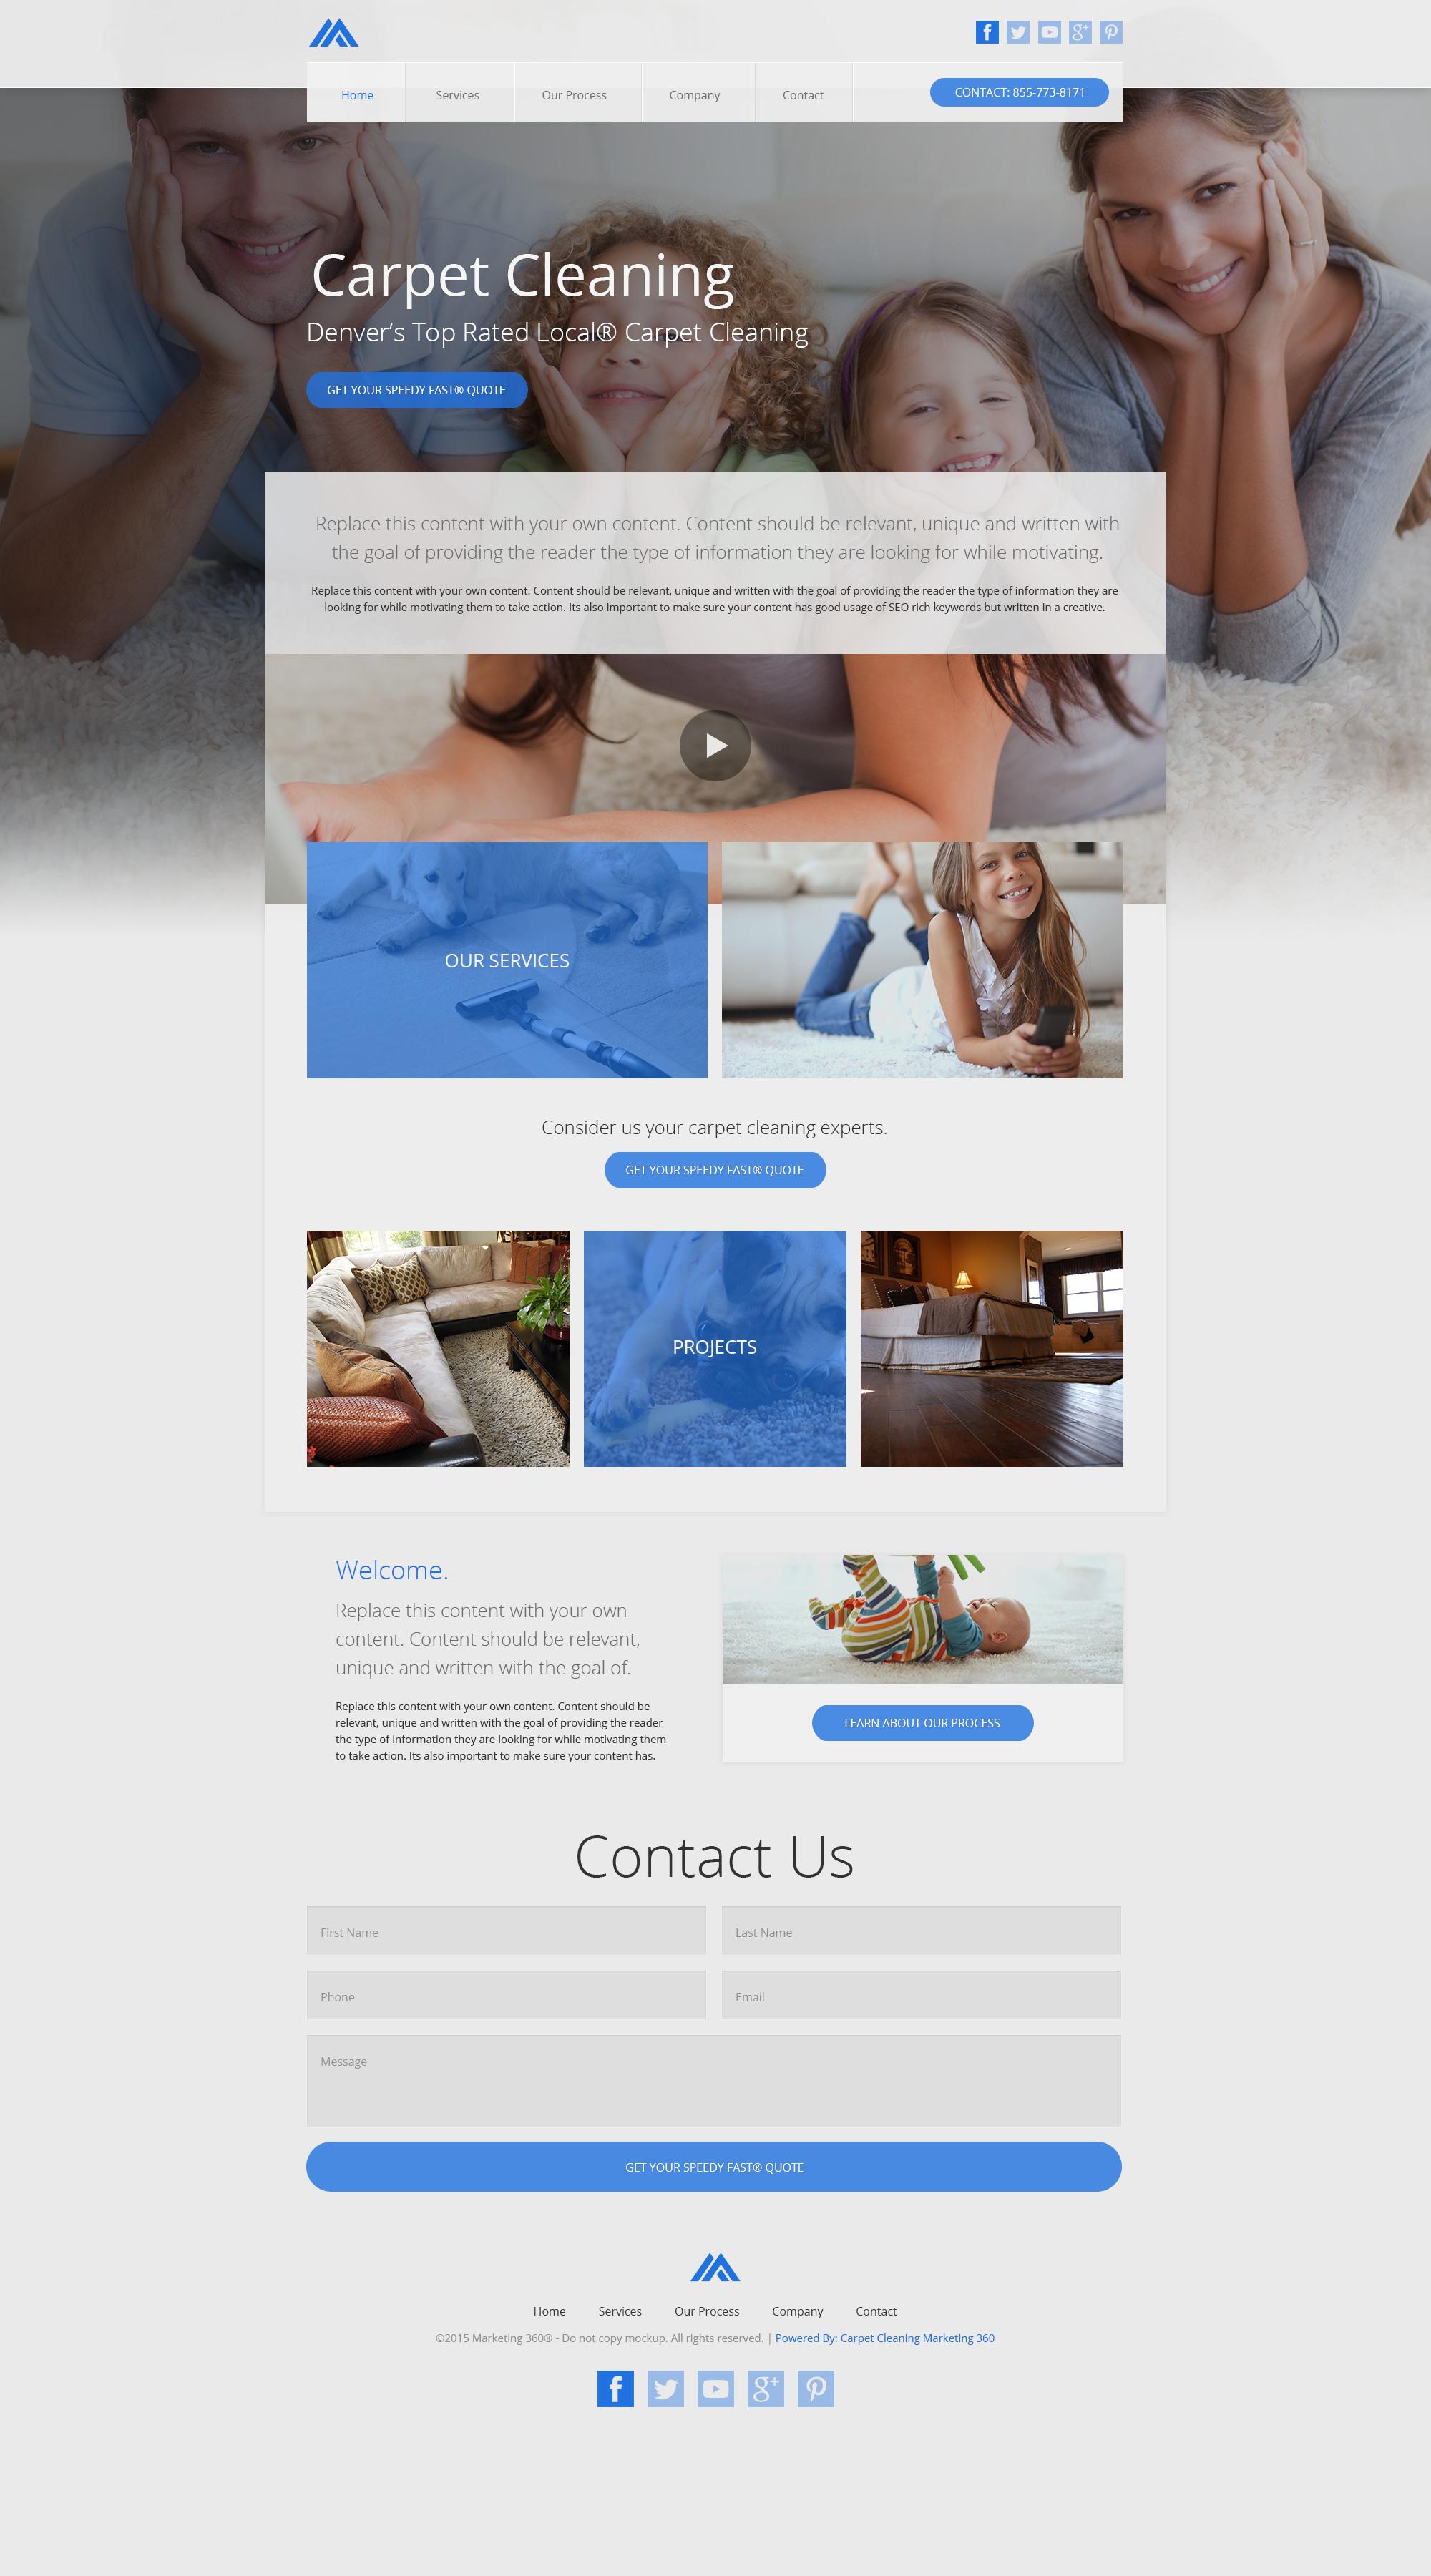 Carpet cleaning website templates mobile responsive designs design rm19005 baanklon Gallery